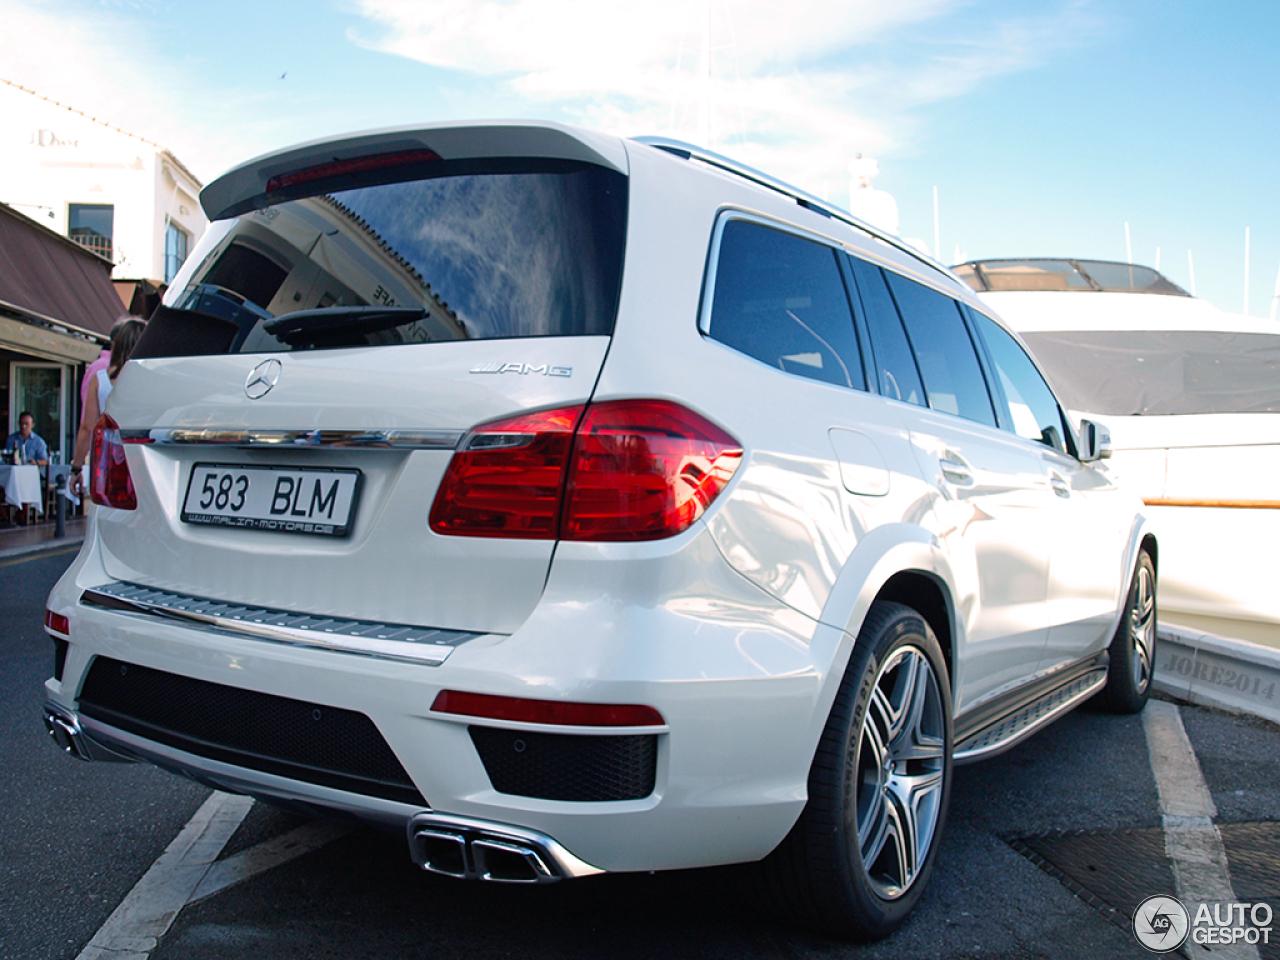 Mercedes benz gl 63 amg x166 7 february 2015 autogespot for Mercedes benz gl amg 2015